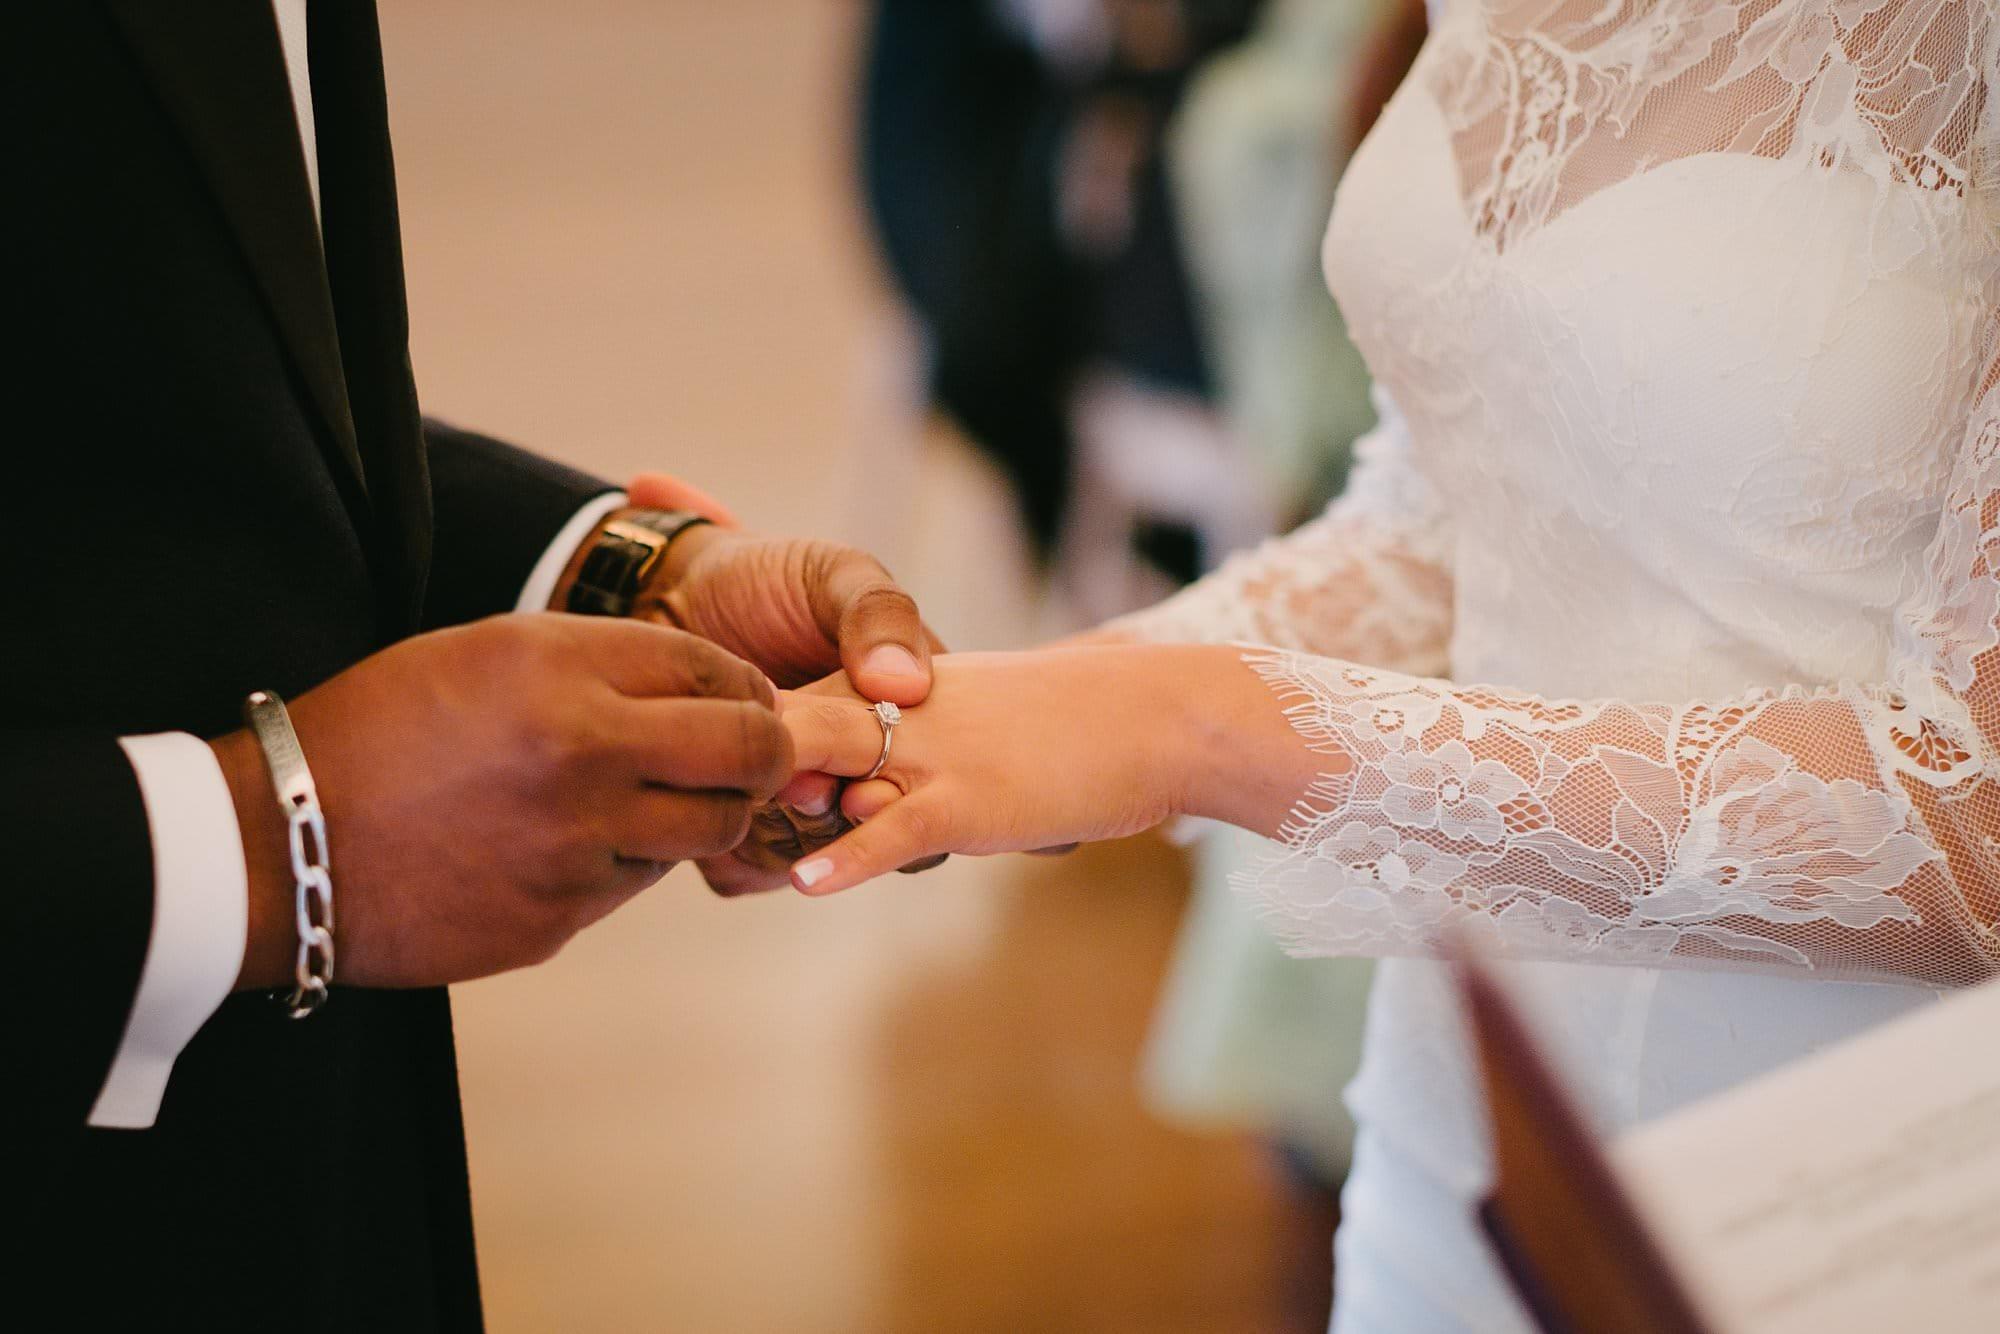 asia house london wedding photographer 023 - Rachel + Gabriel   Asia House Wedding Photography